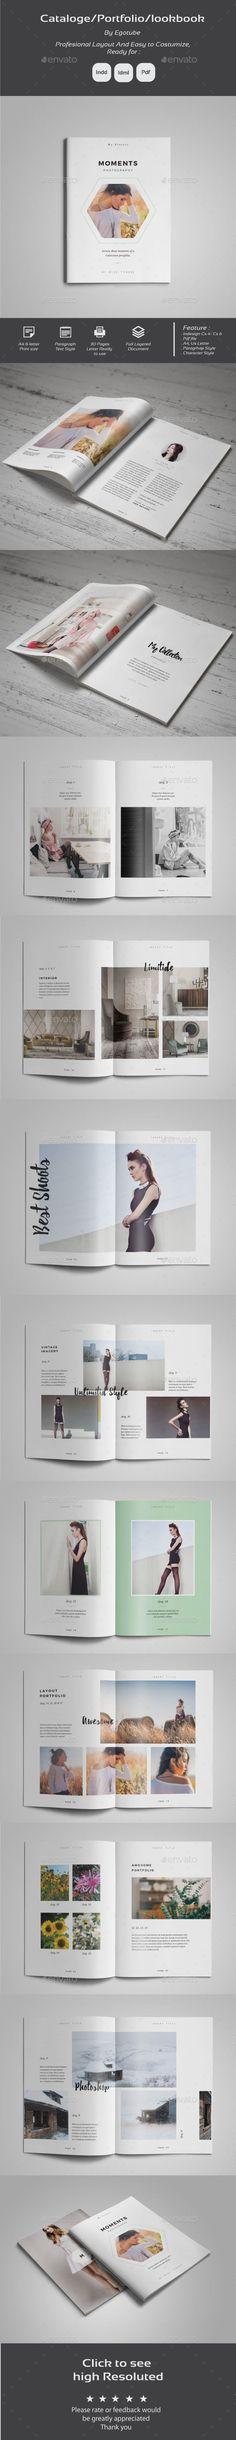 Indesign Portfolio Template InDesign INDD. Download here: http ...